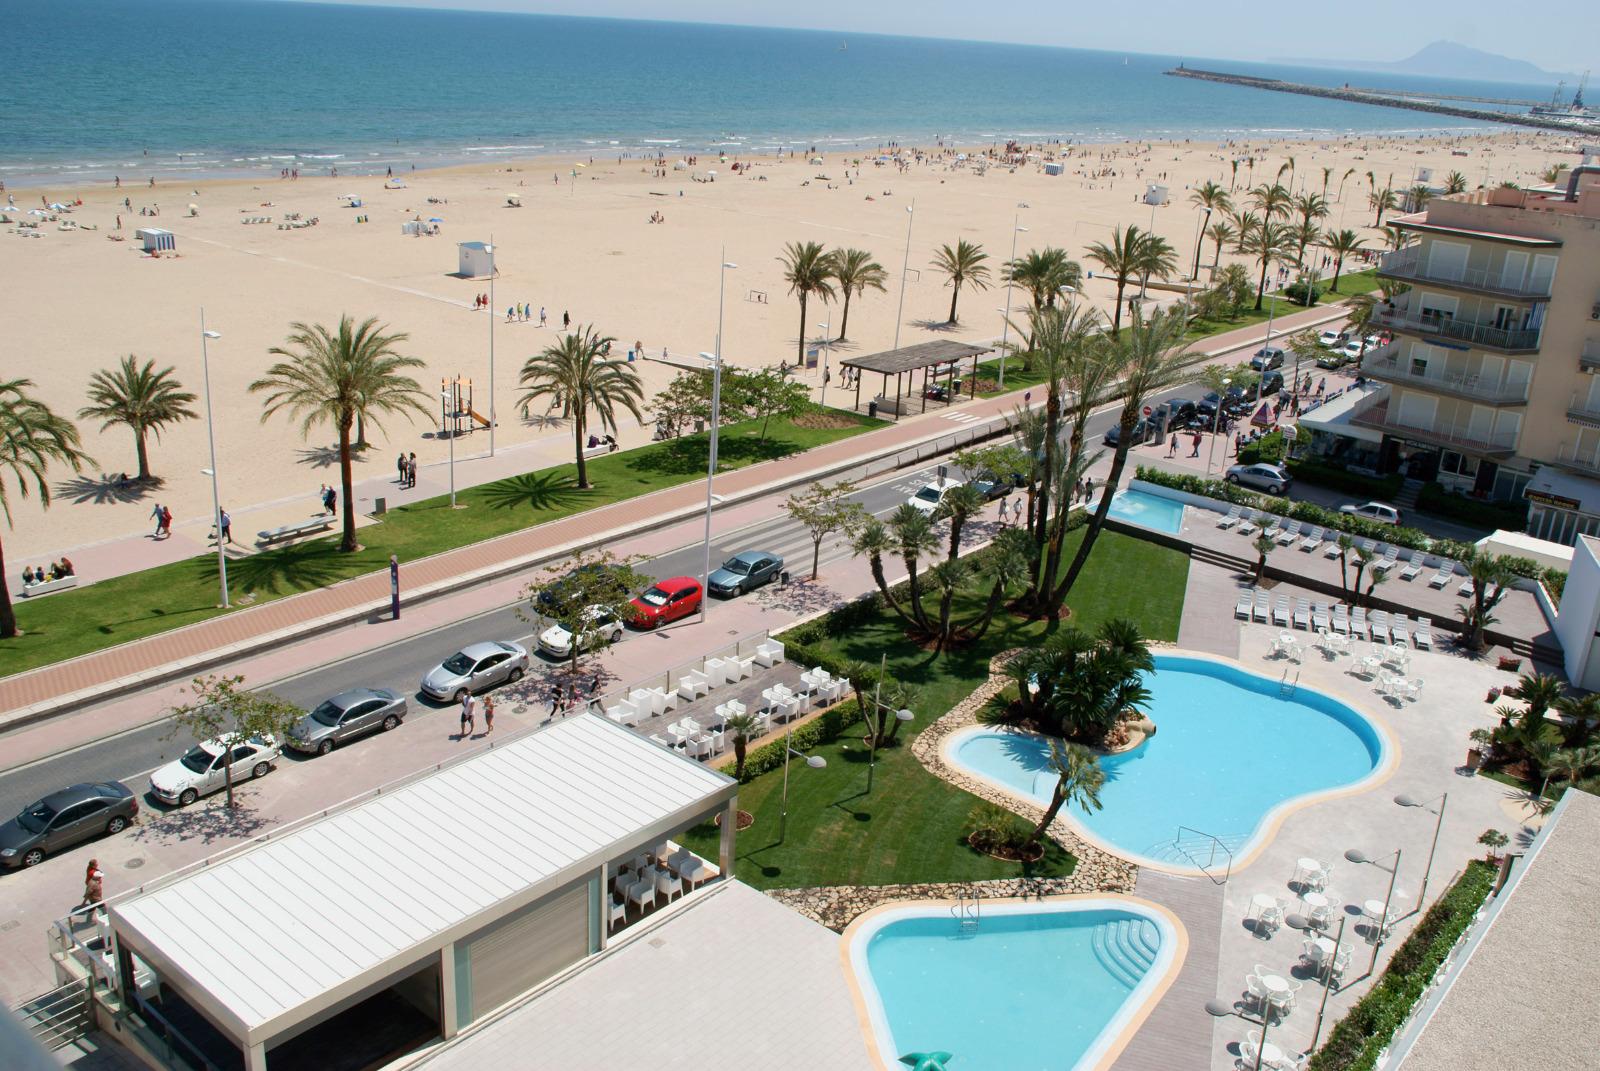 hotel rh bayren vistas playa gandia